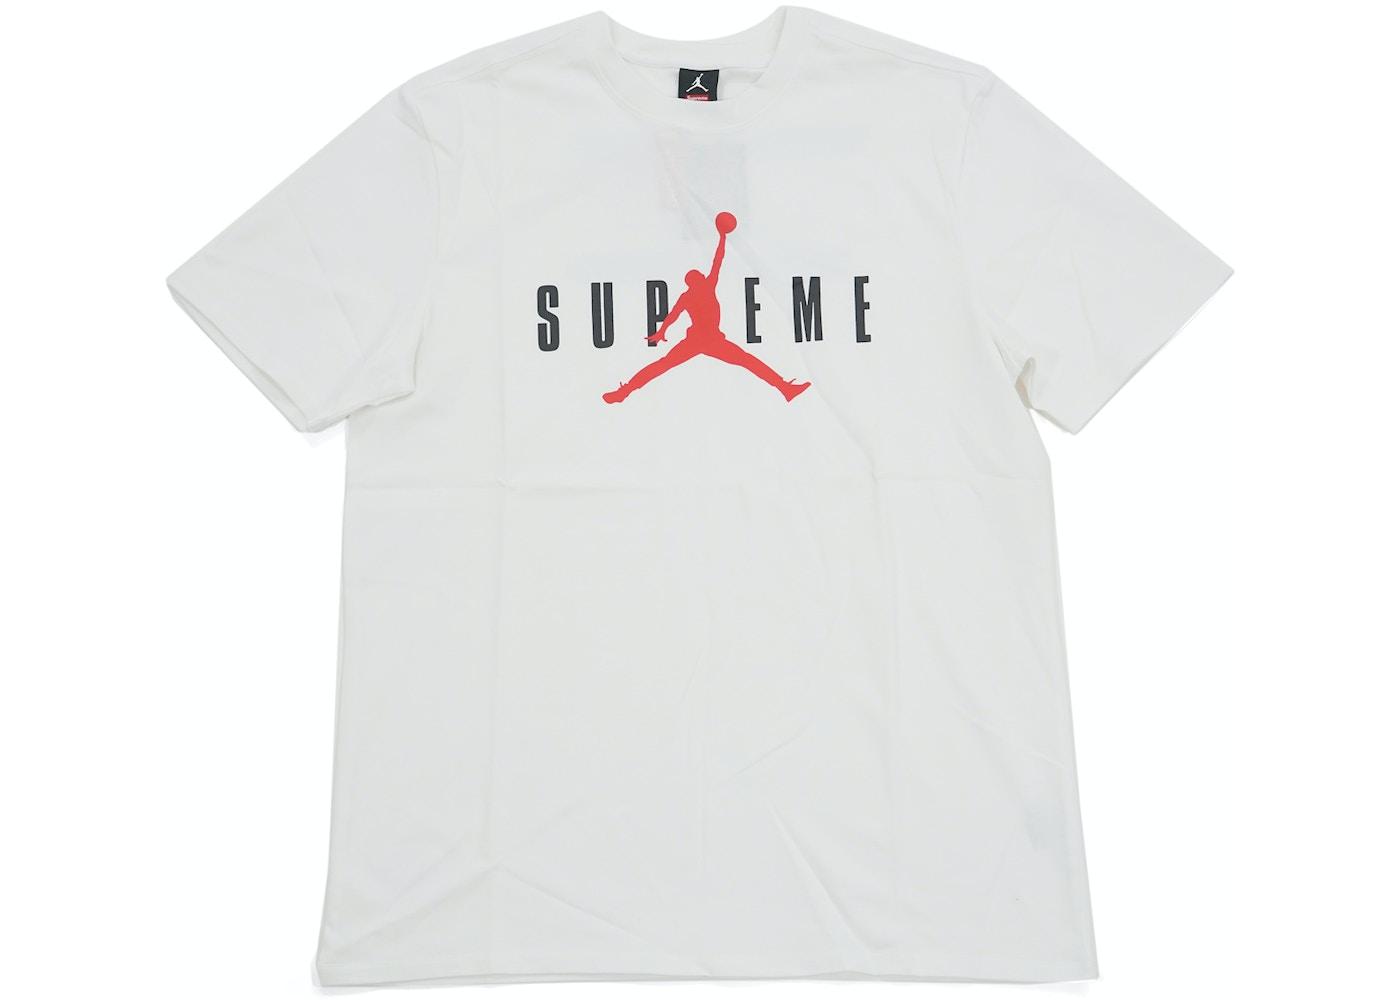 34e6c28b9e0 Supreme Jordan Tee White - FW15